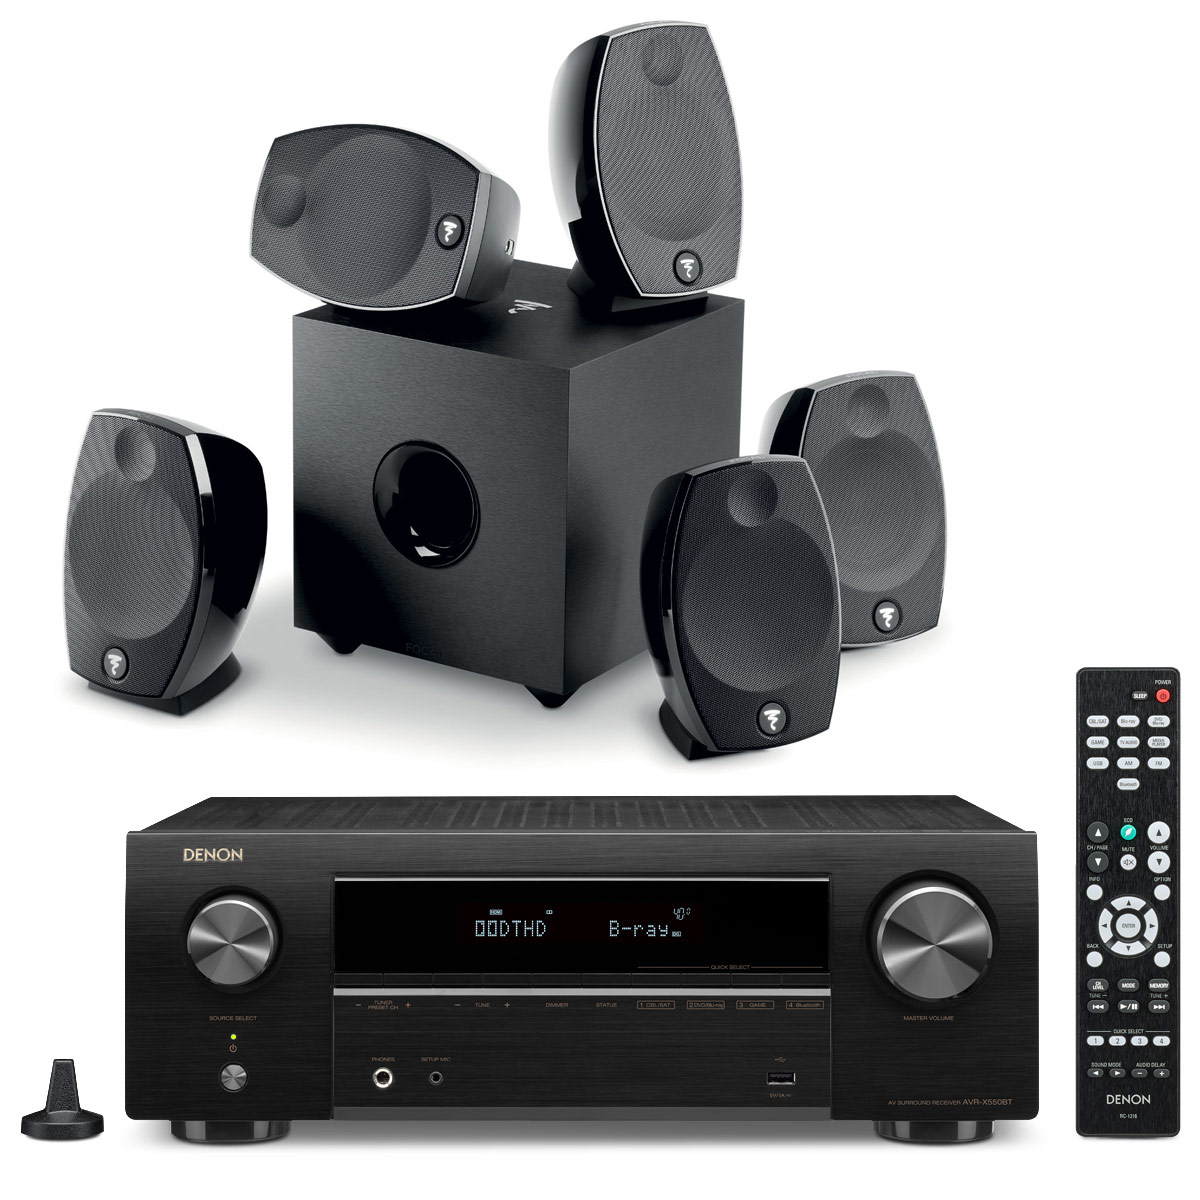 Ensemble home cinéma Denon AVR-X550BT + Focal Sib Evo 5.1 Ampli-tuner 5.2 Home Cinema 3D Ready 130 Watts - DTS-HD / Dolby True HD - 5 entrées HDMI 2.0 4K Ultra HD HDCP 2.2 - HDR / Dolby Vision / HLG - Bluetooth + Pack d'enceintes 5.1